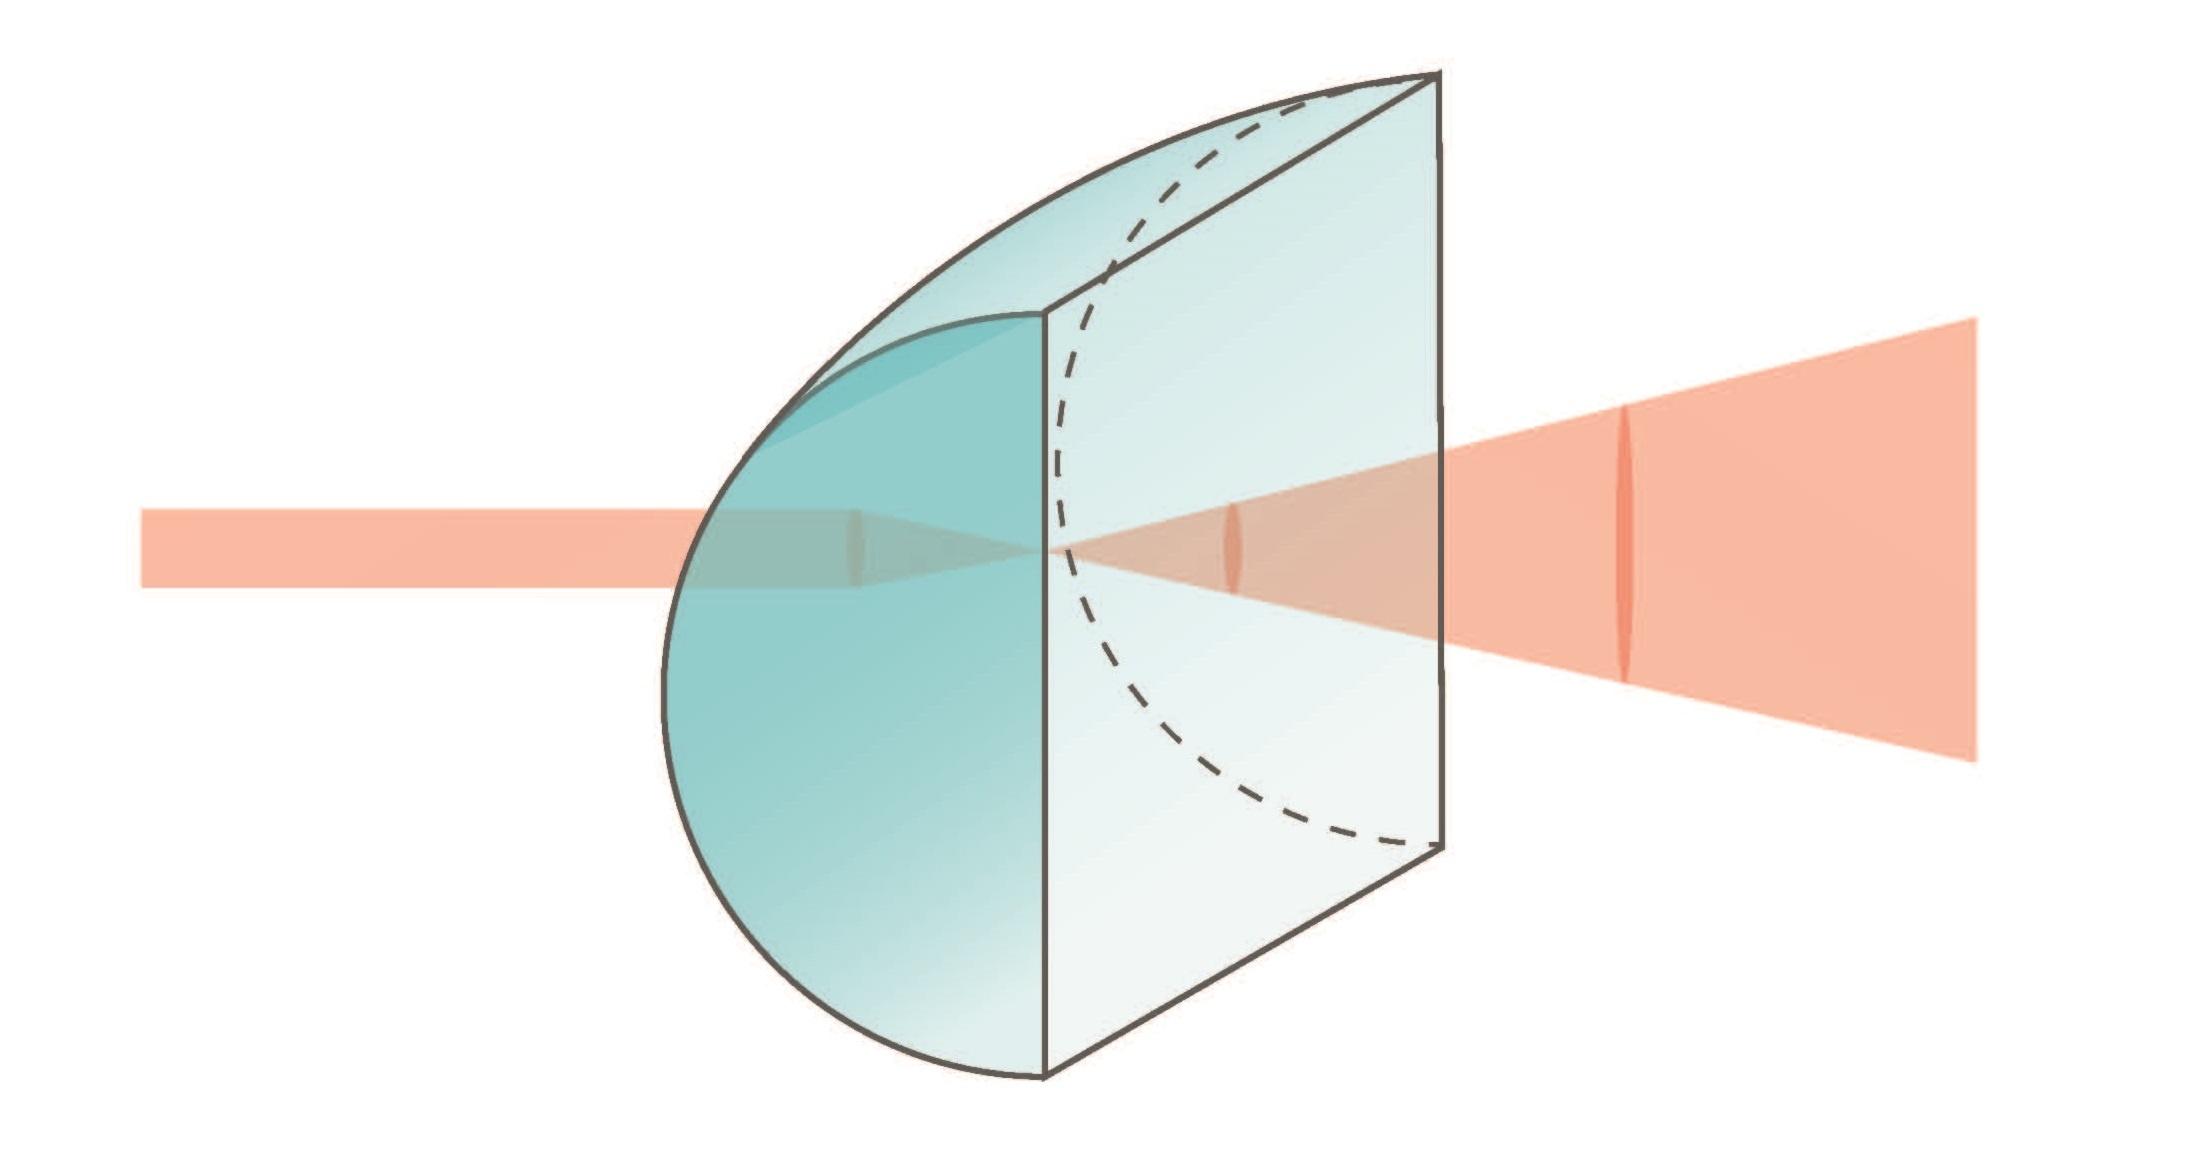 cylinder-drawing-2.jpg